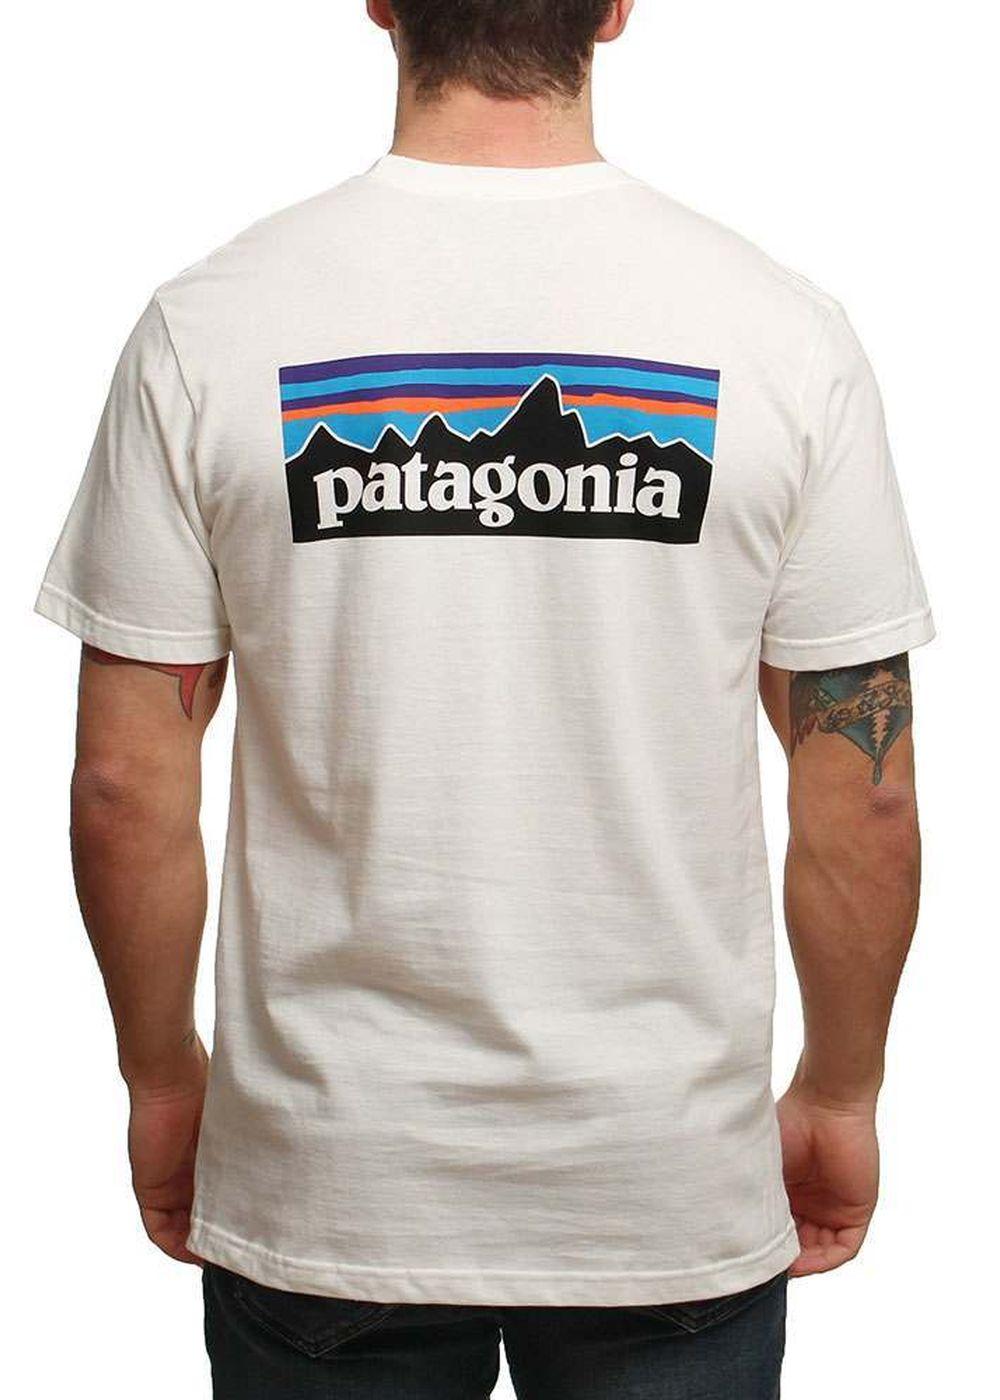 patagonia-p6-logo-tee-white